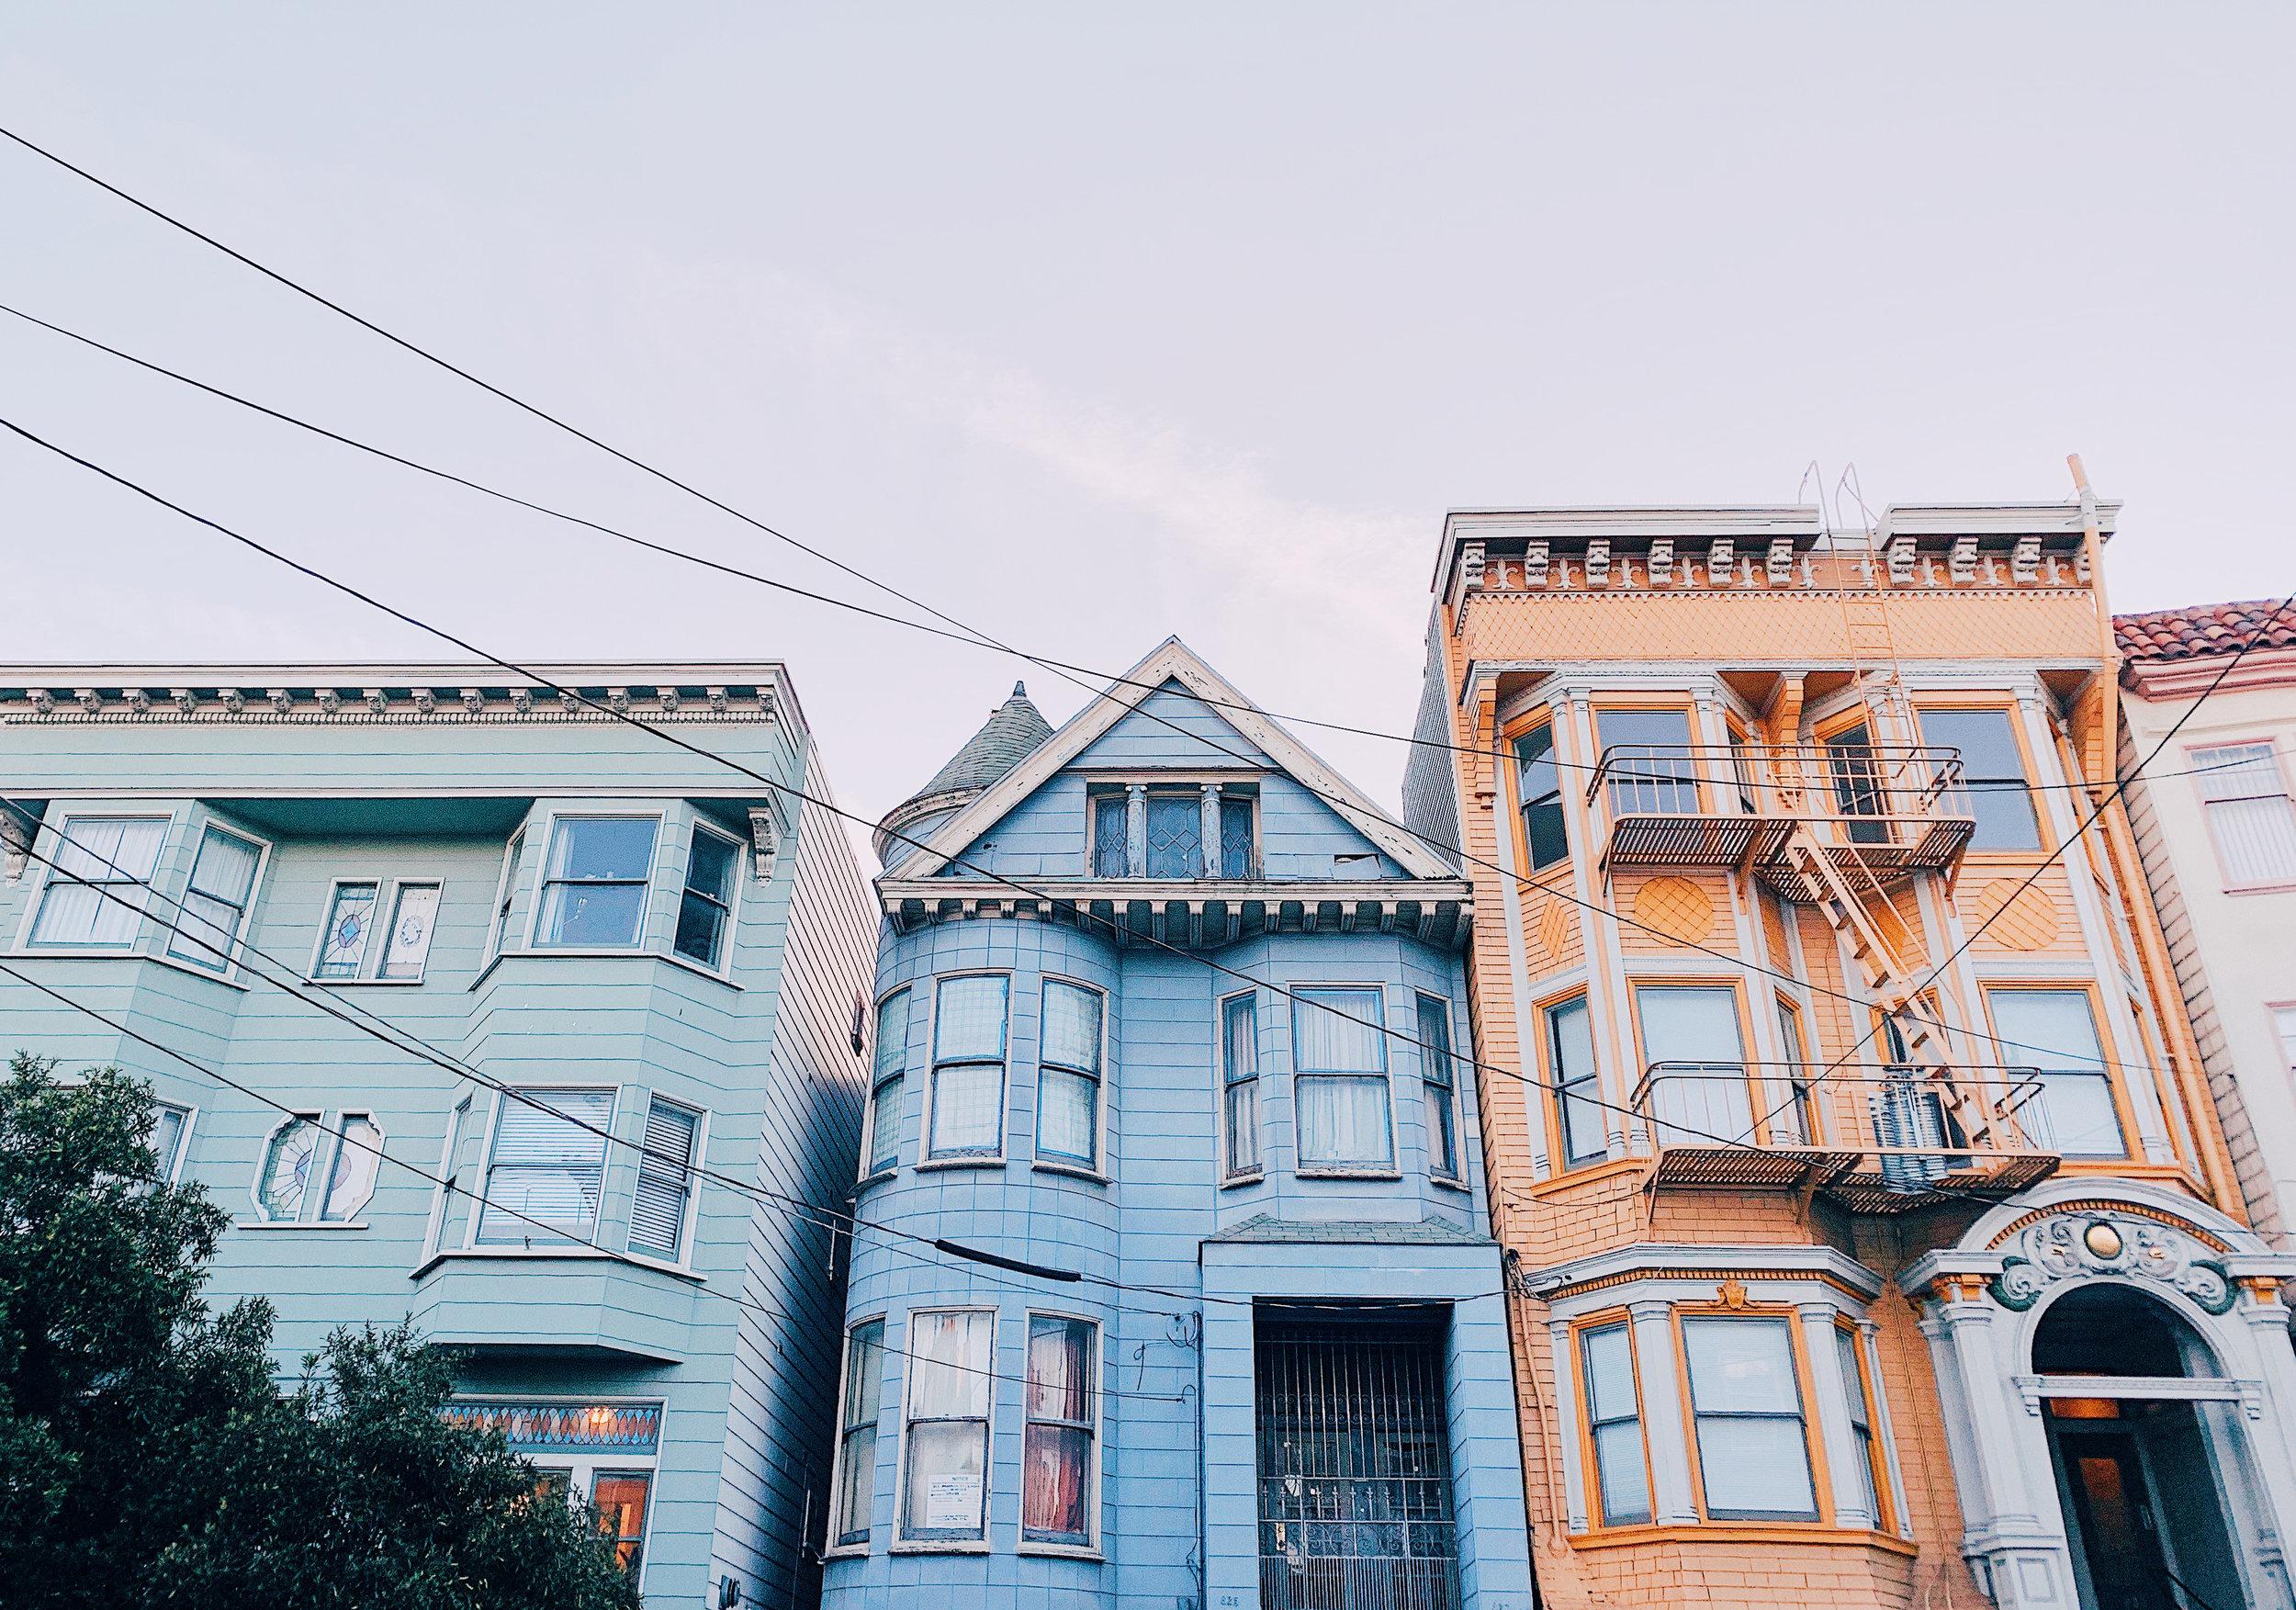 San Francisco Victorian Houses.jpg